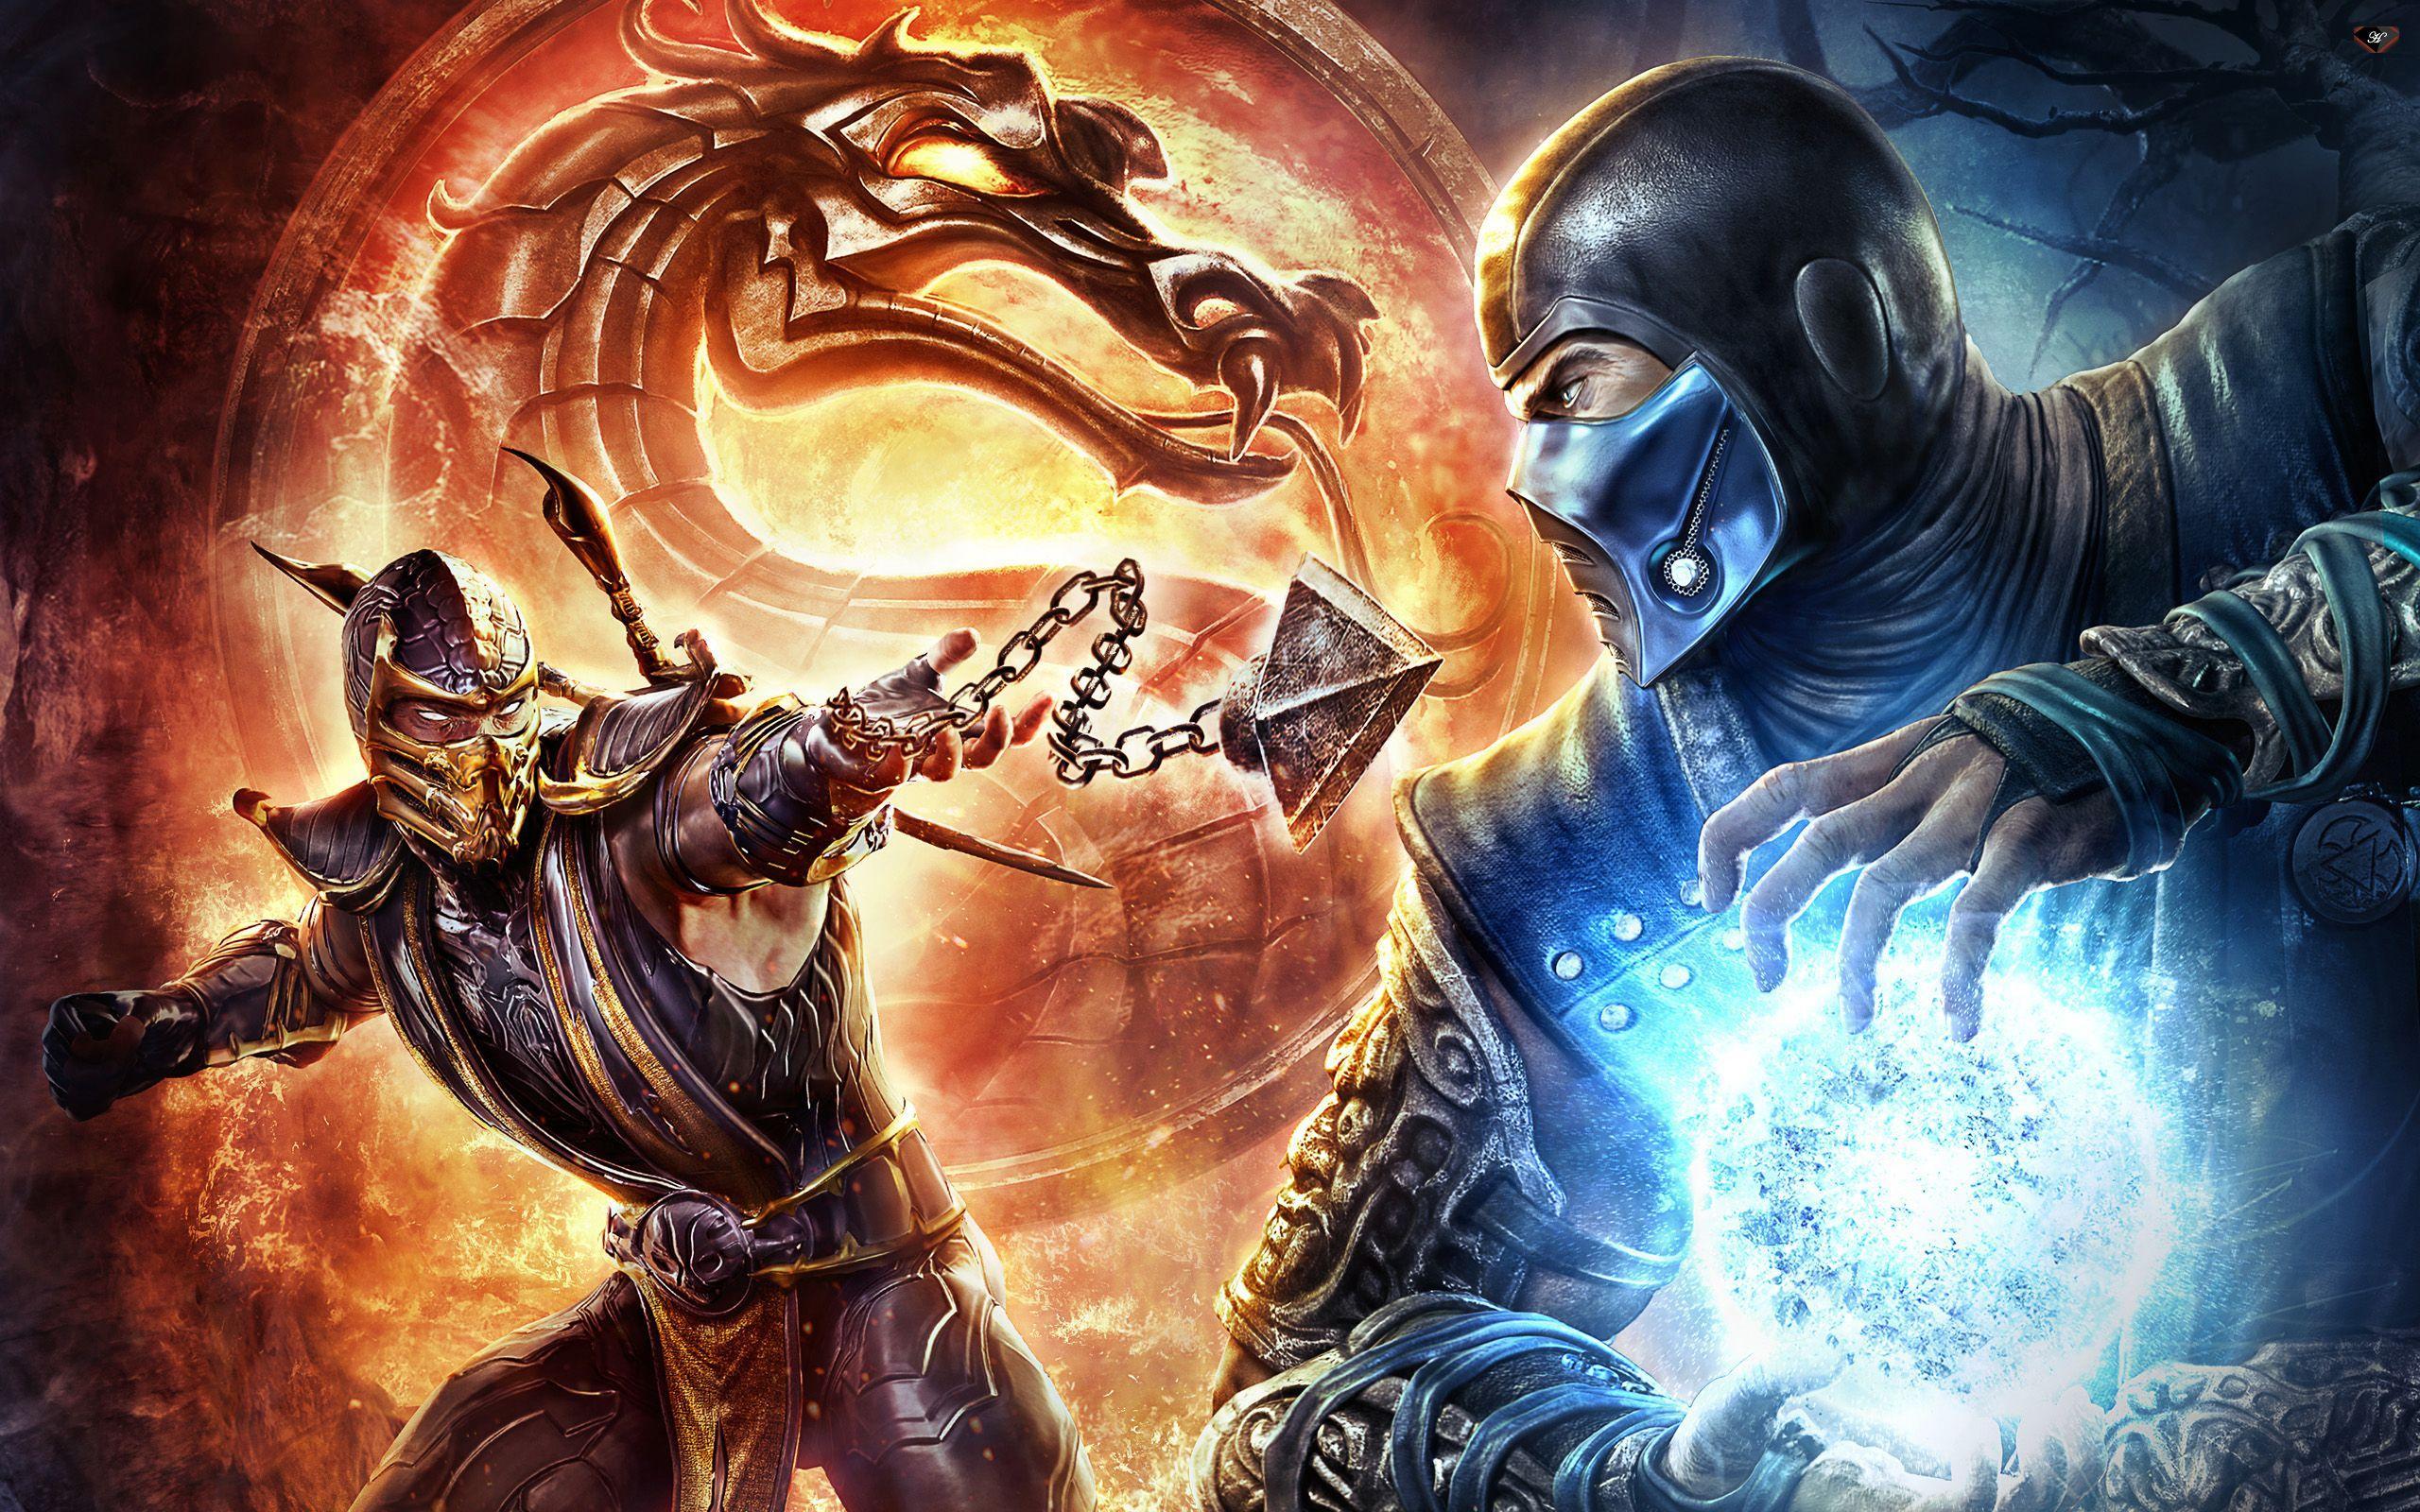 Mortal Kombat Wallpapers - Top Free